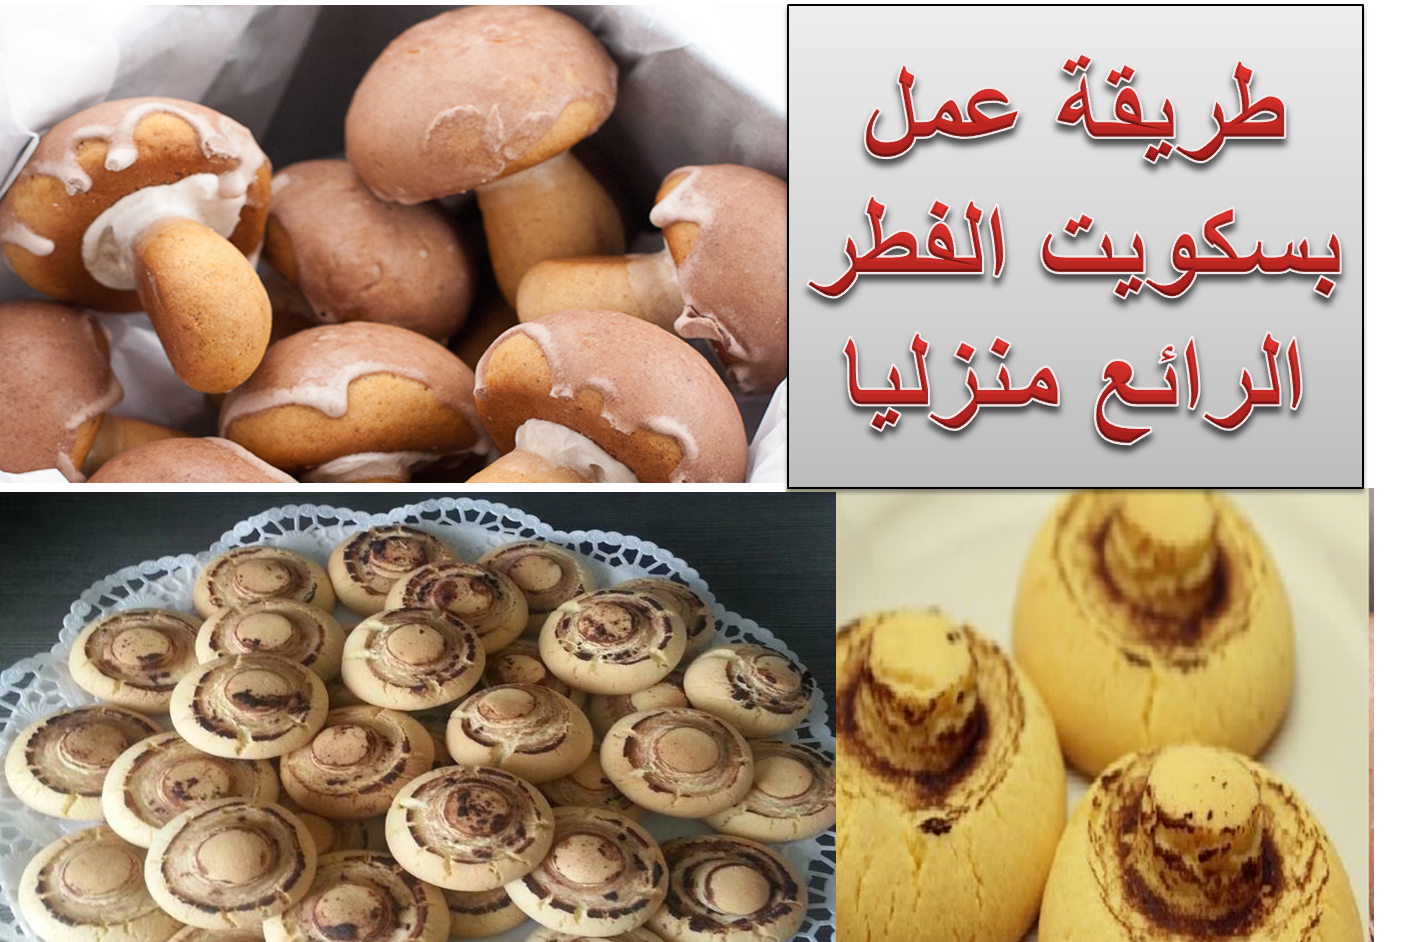 بسكــويت الفـــطر او المشــروم Mushroom Biscuits Stuffed Mushrooms Food Vegetables